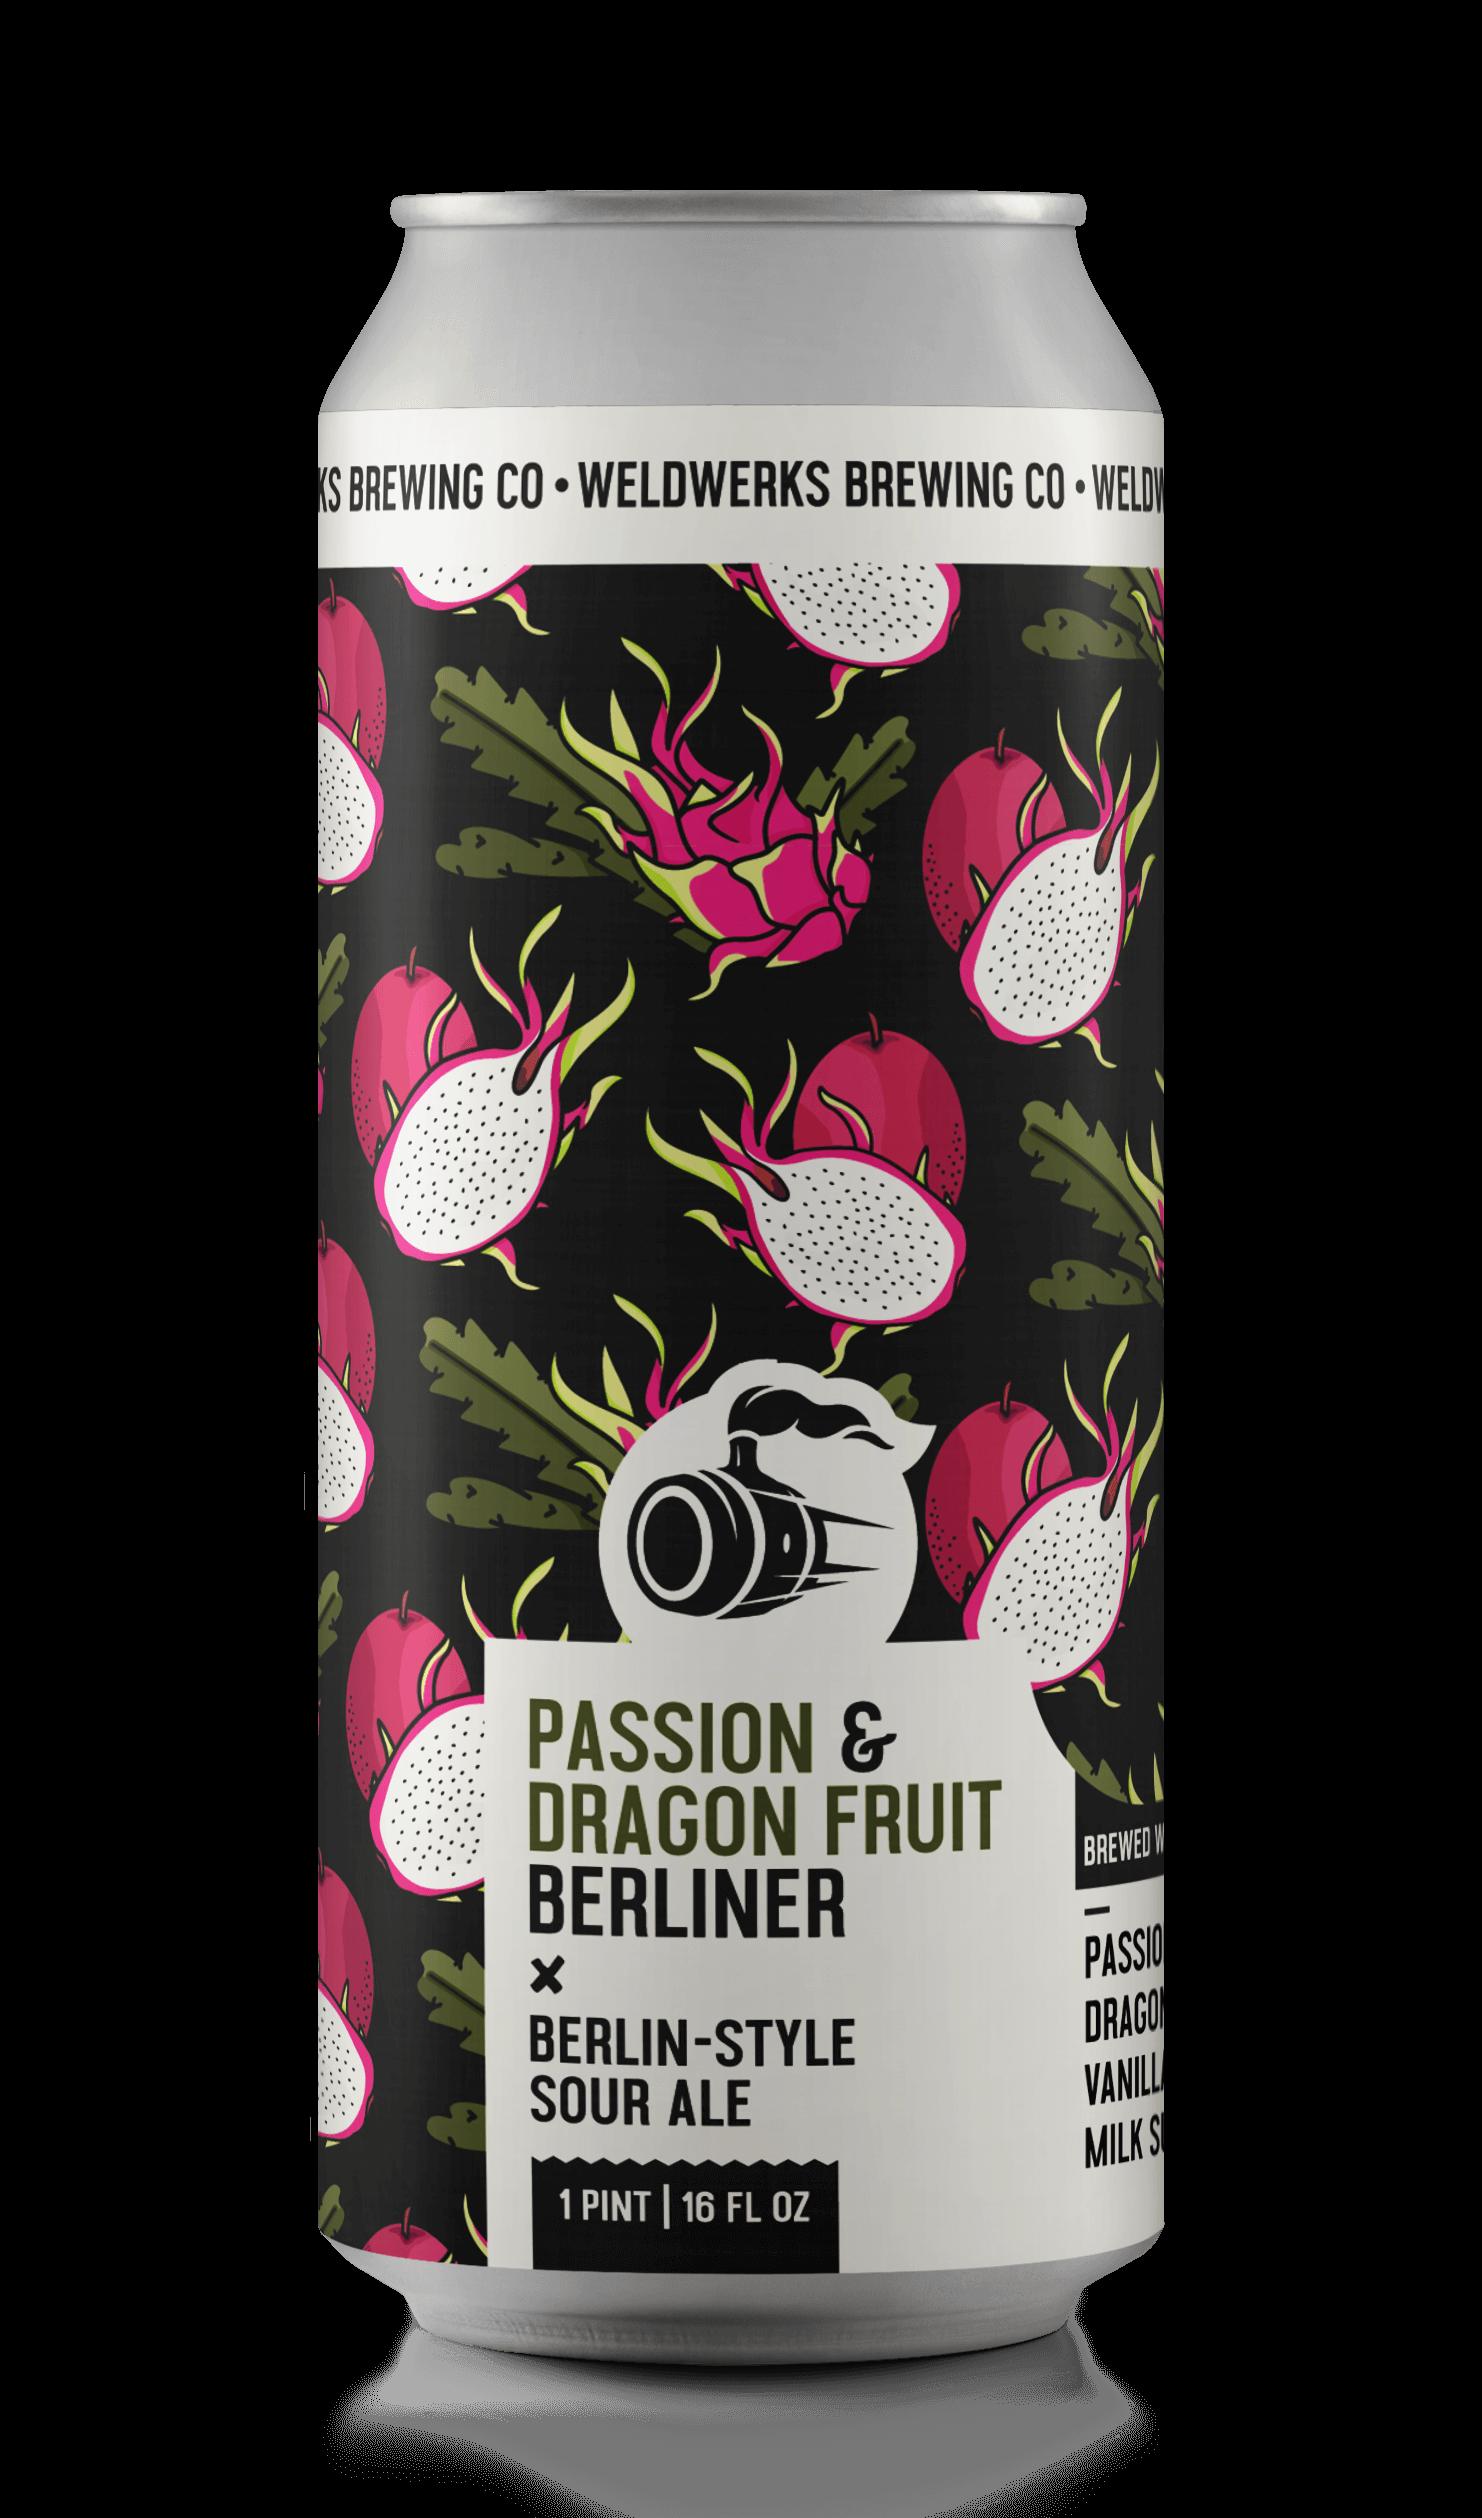 Passion & Dragon Fruit Berliner